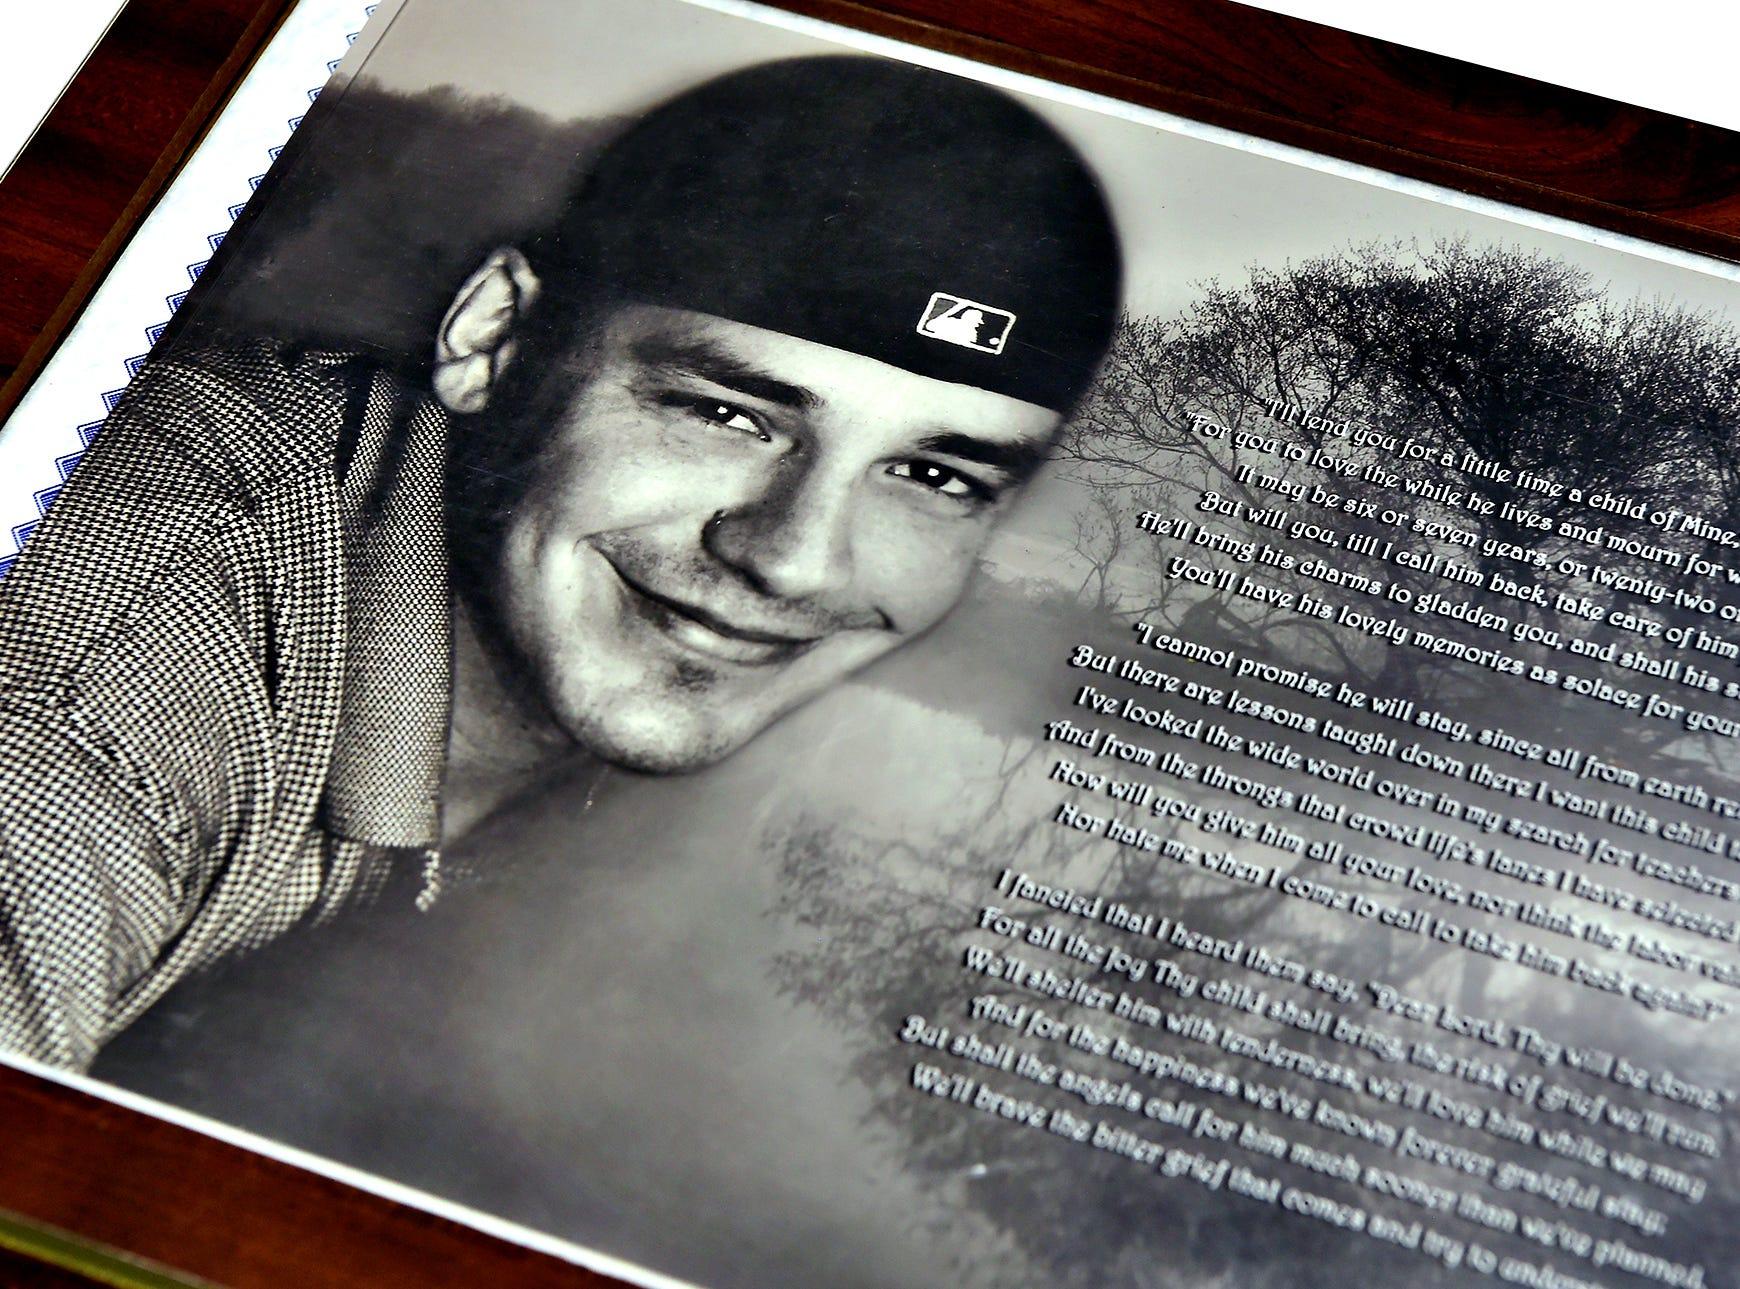 Binghamton resident Aaron DeRigo died of an overdose in January 2014.  December 4, 2018.